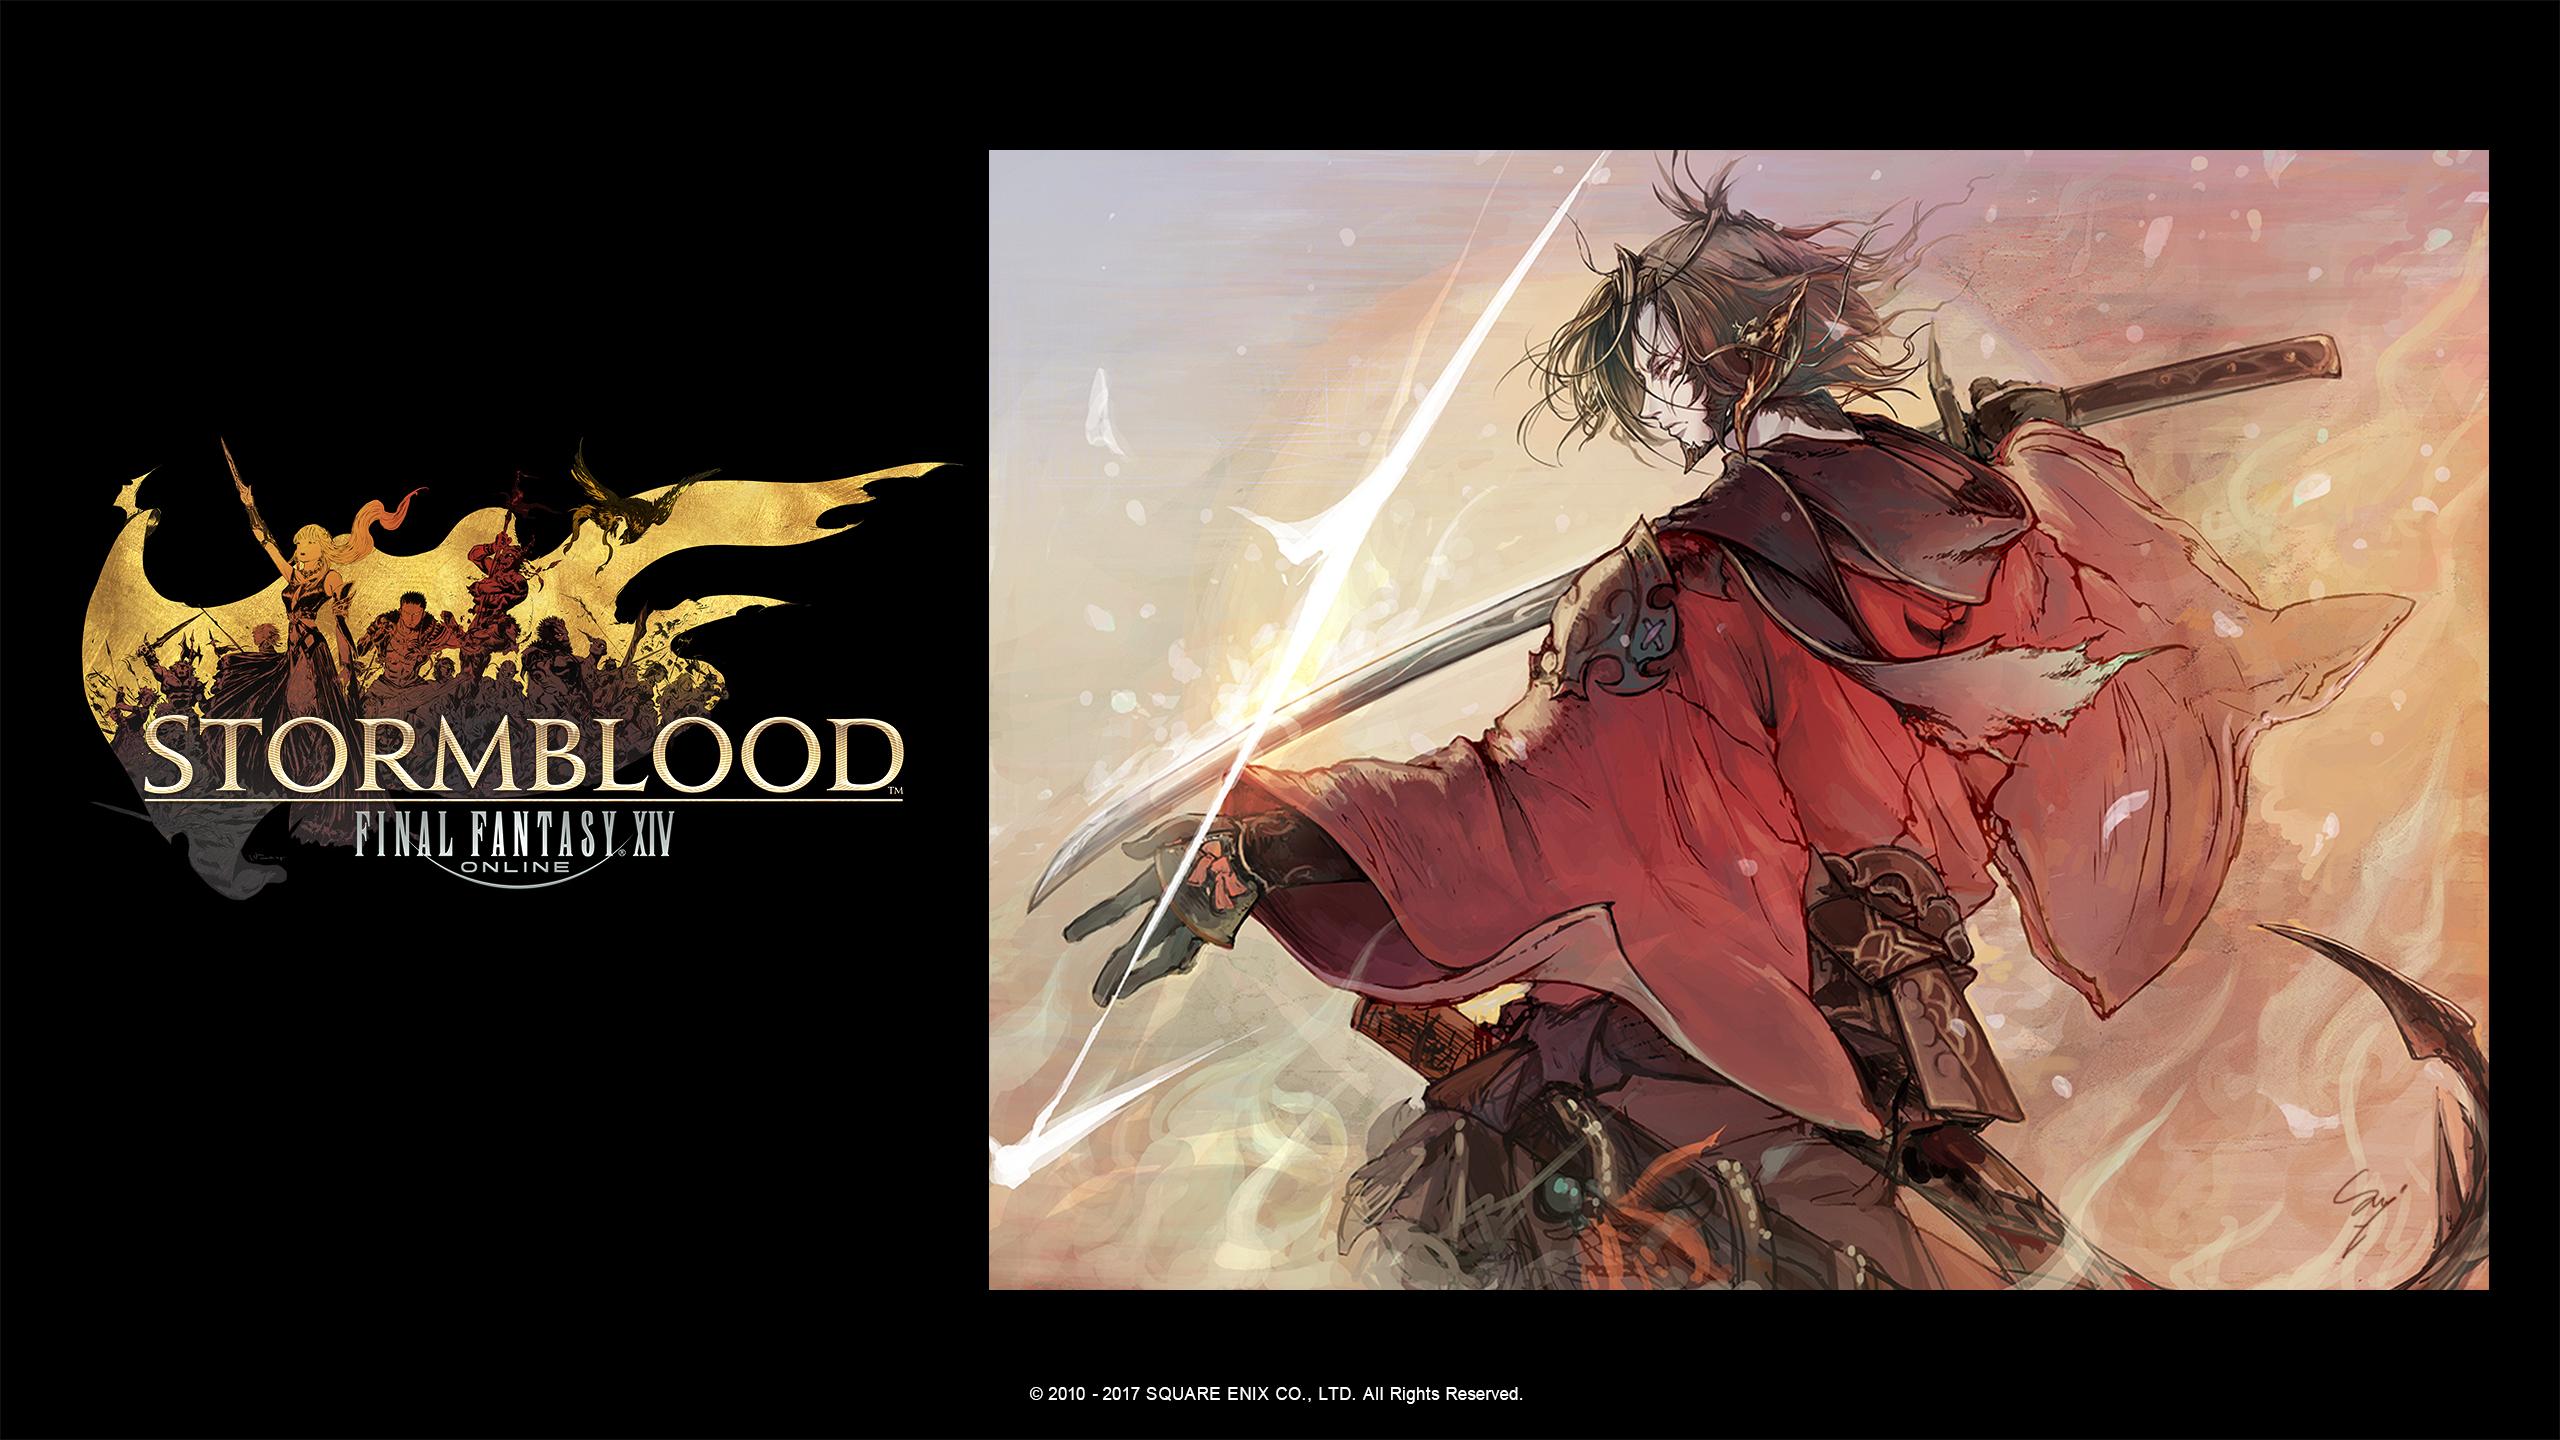 Final Fantasy Xiv Wallpaper 2526636 Zerochan Anime Image Board